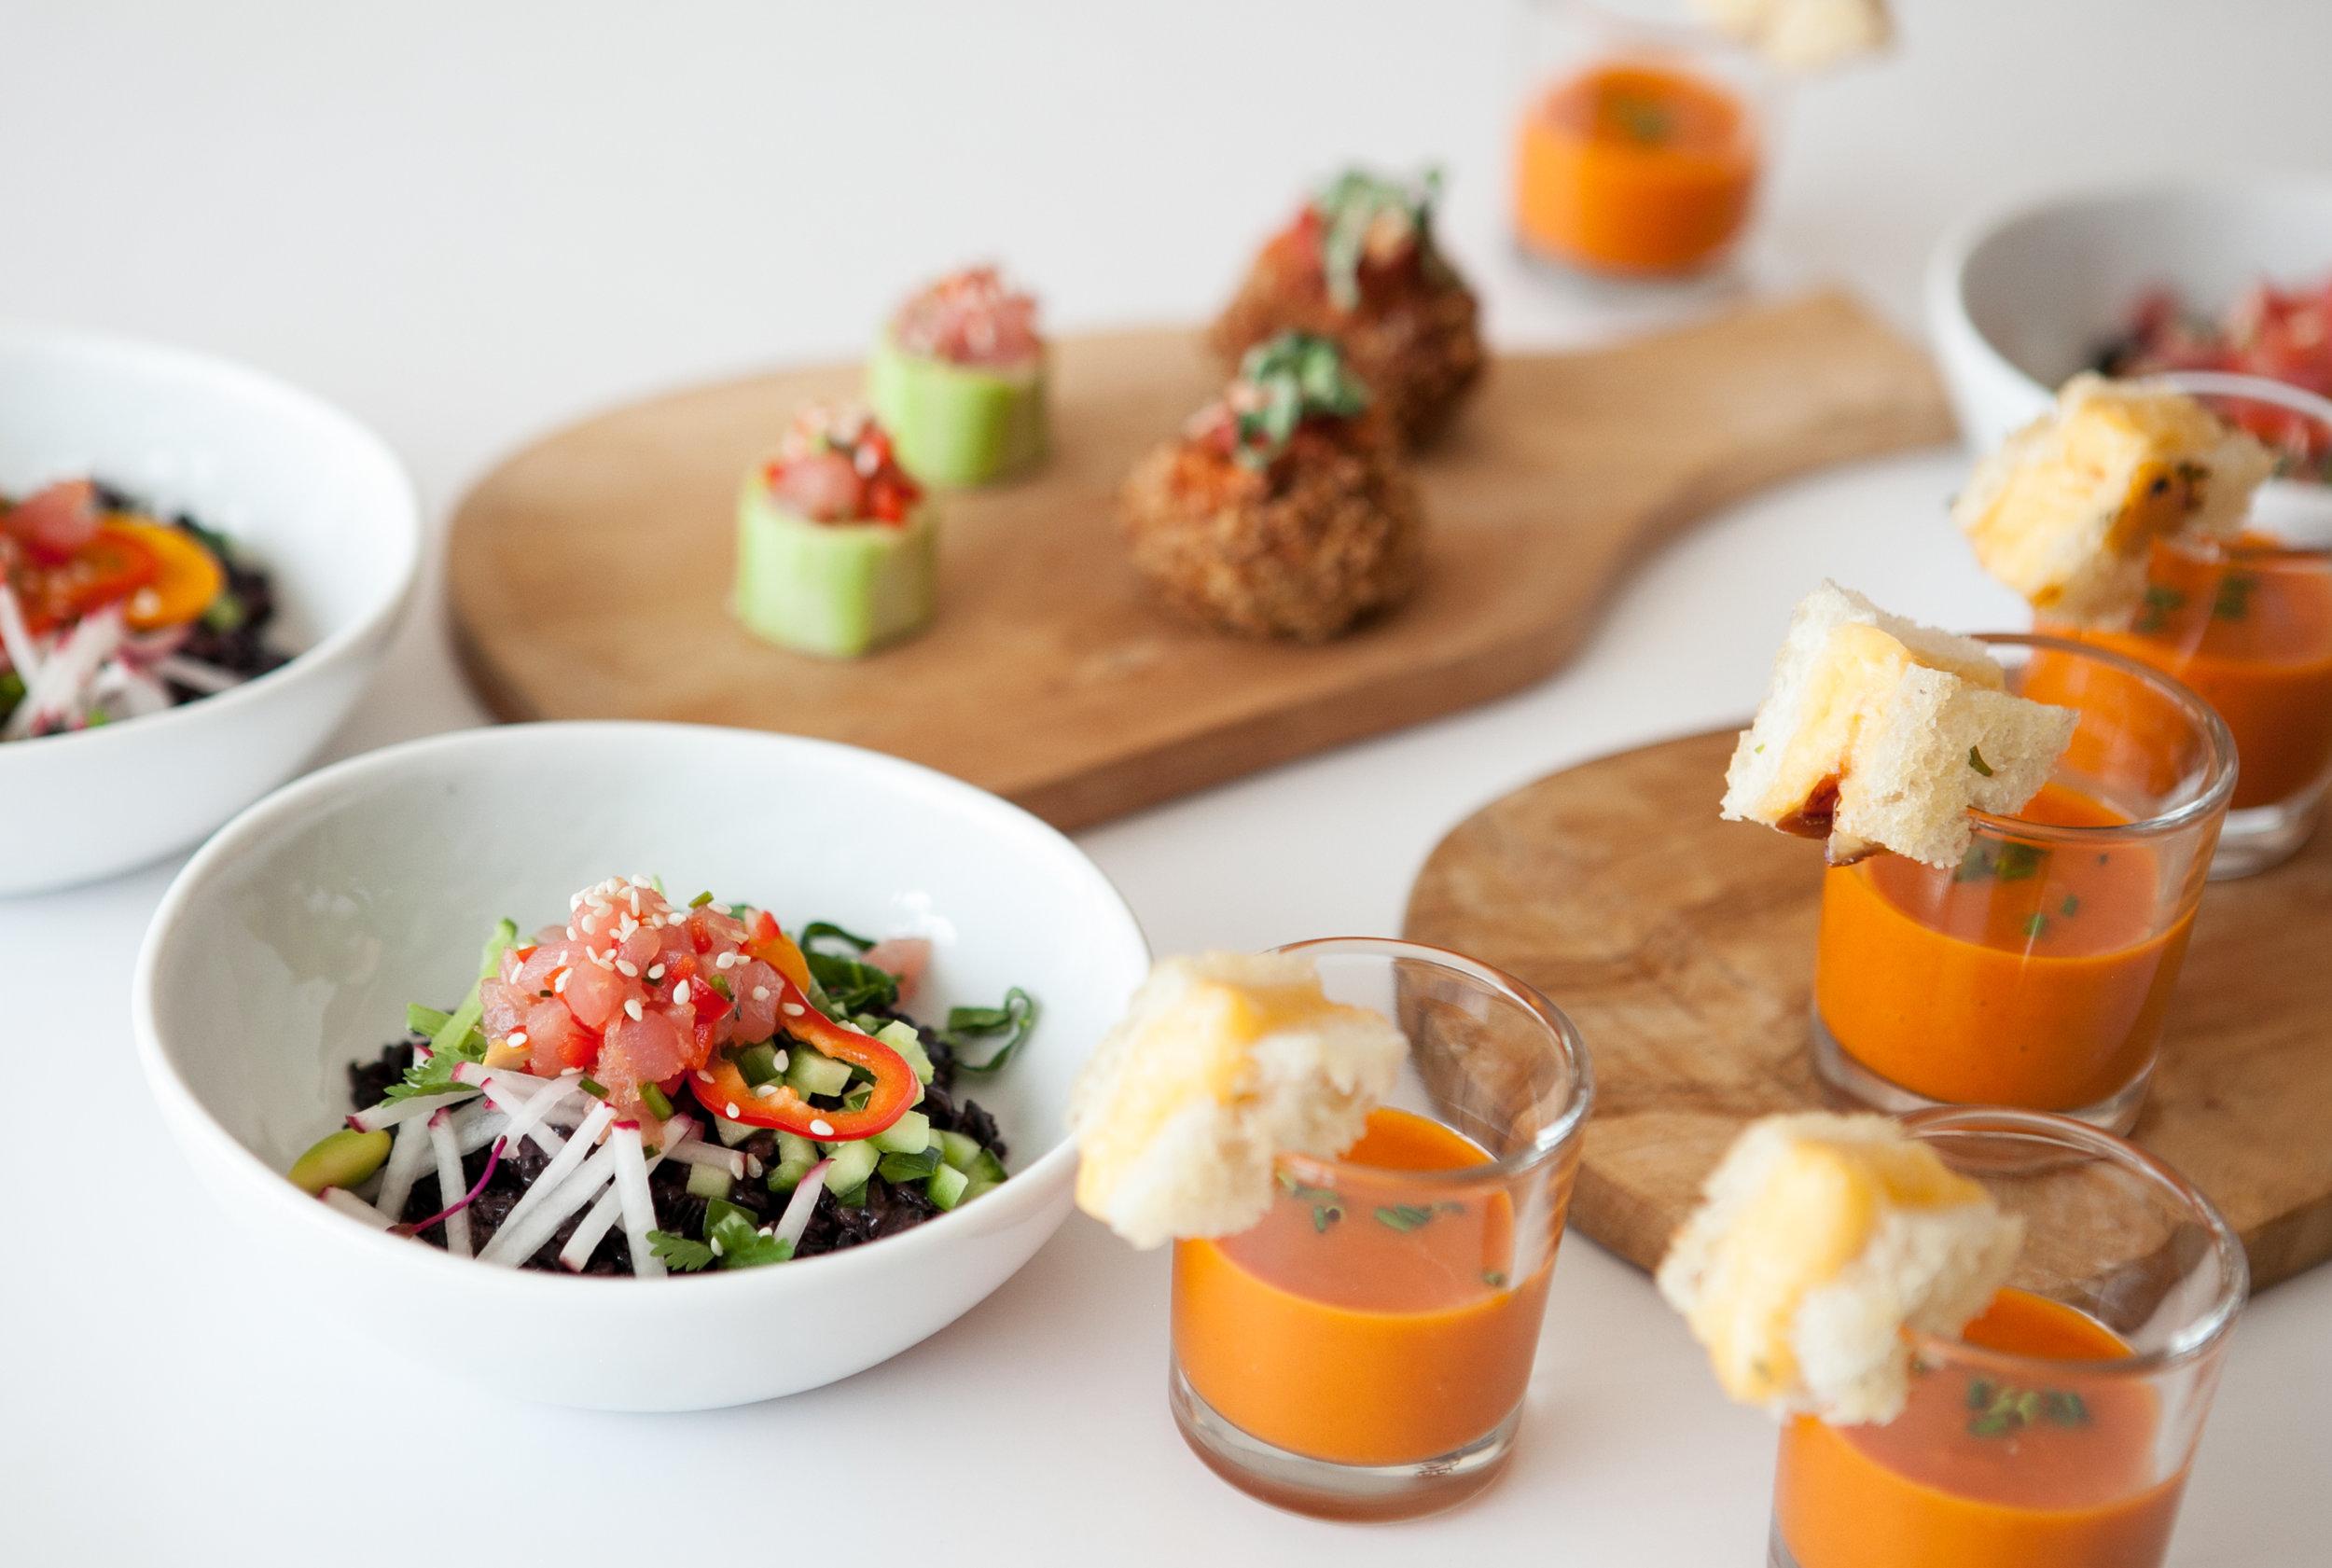 tampa-food-photographer-ablankplate-16.jpg